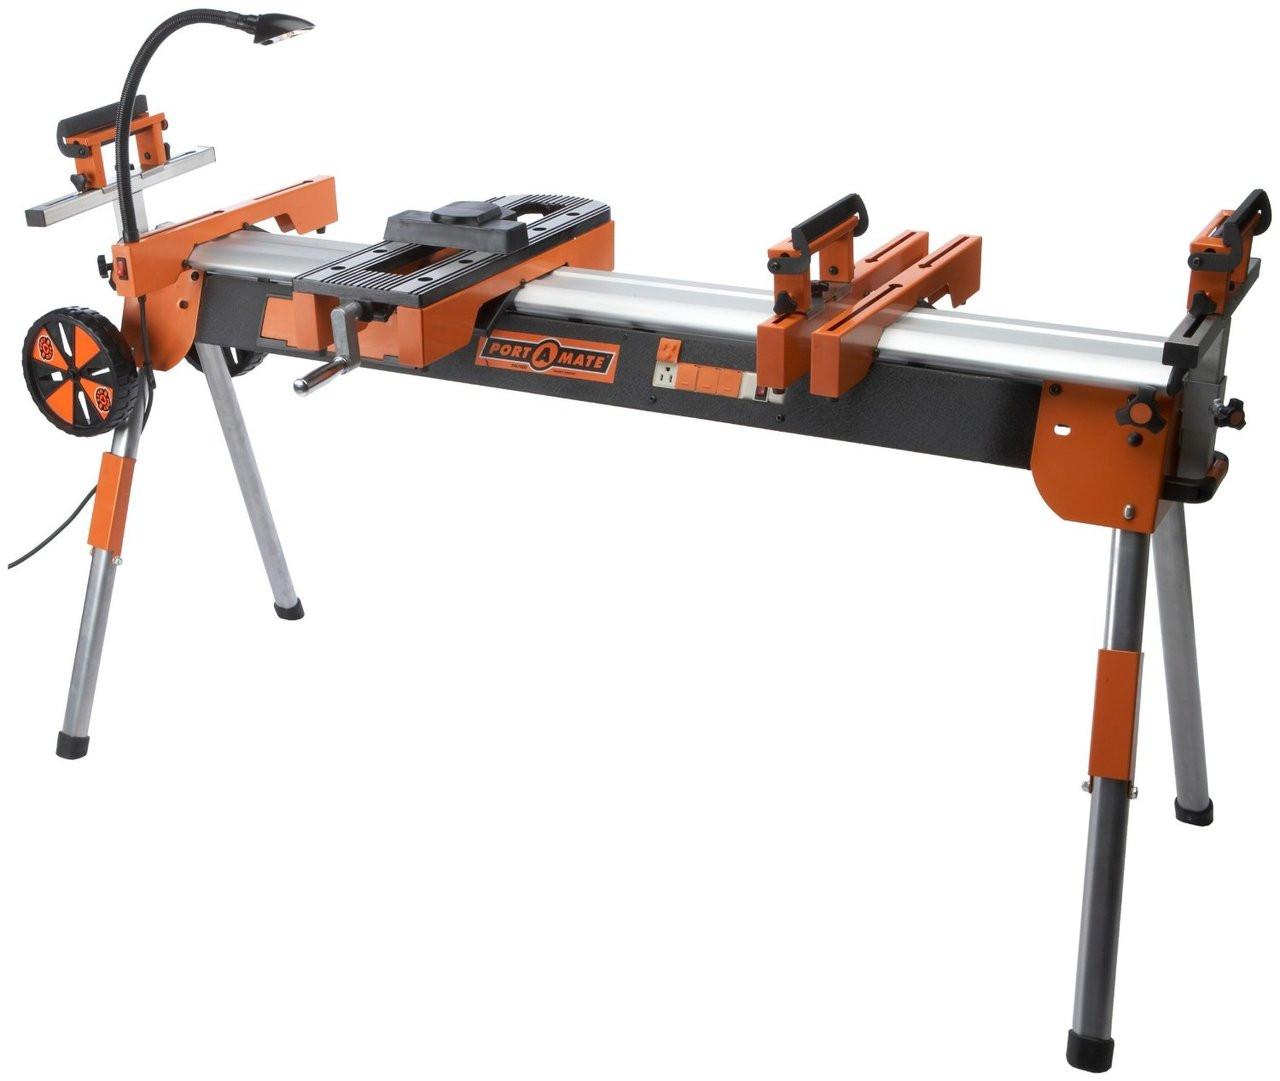 Htc Portamate Pm7000 Miter Saw Work Center